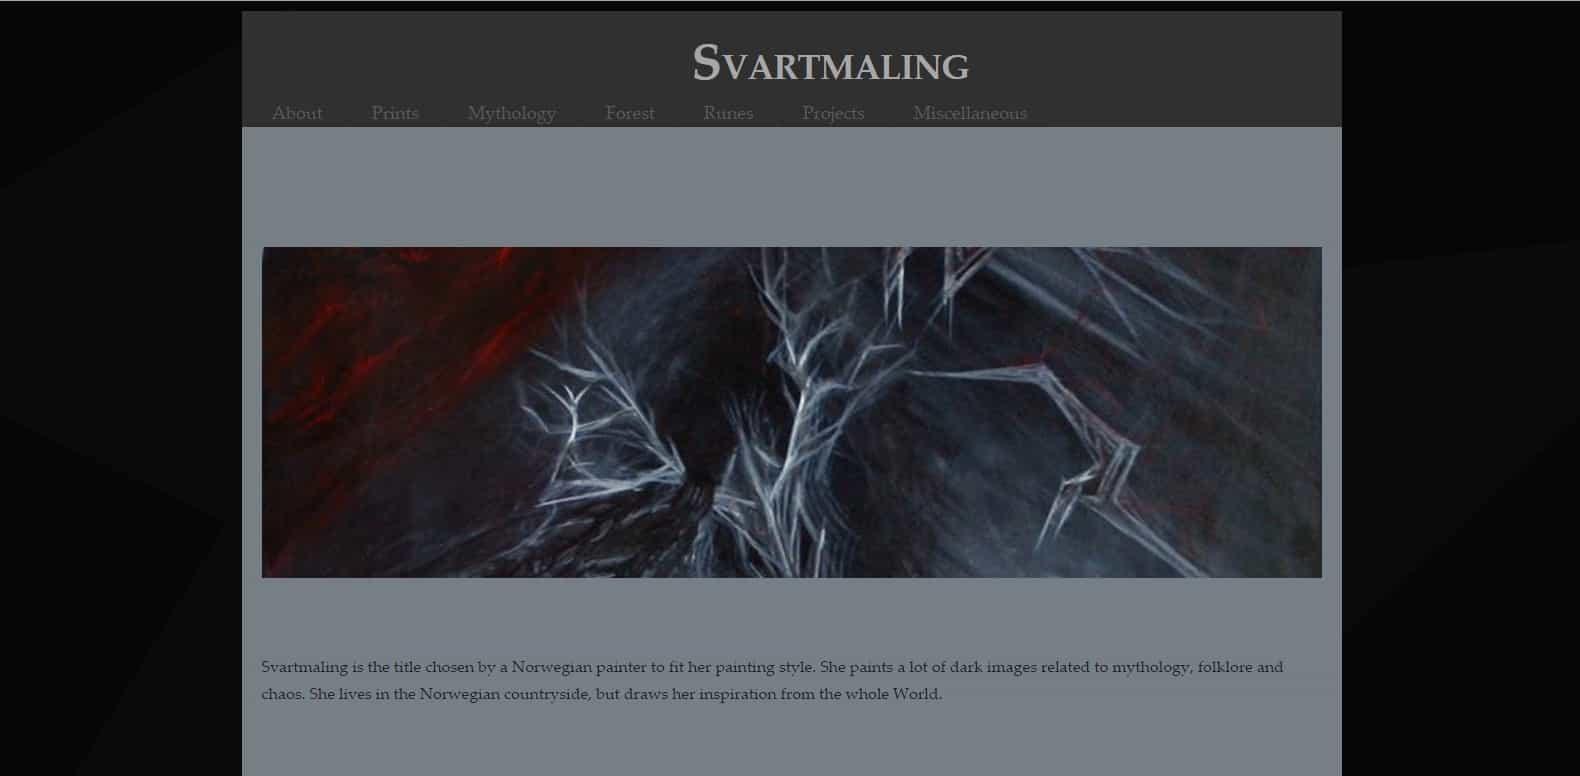 Svartmaling